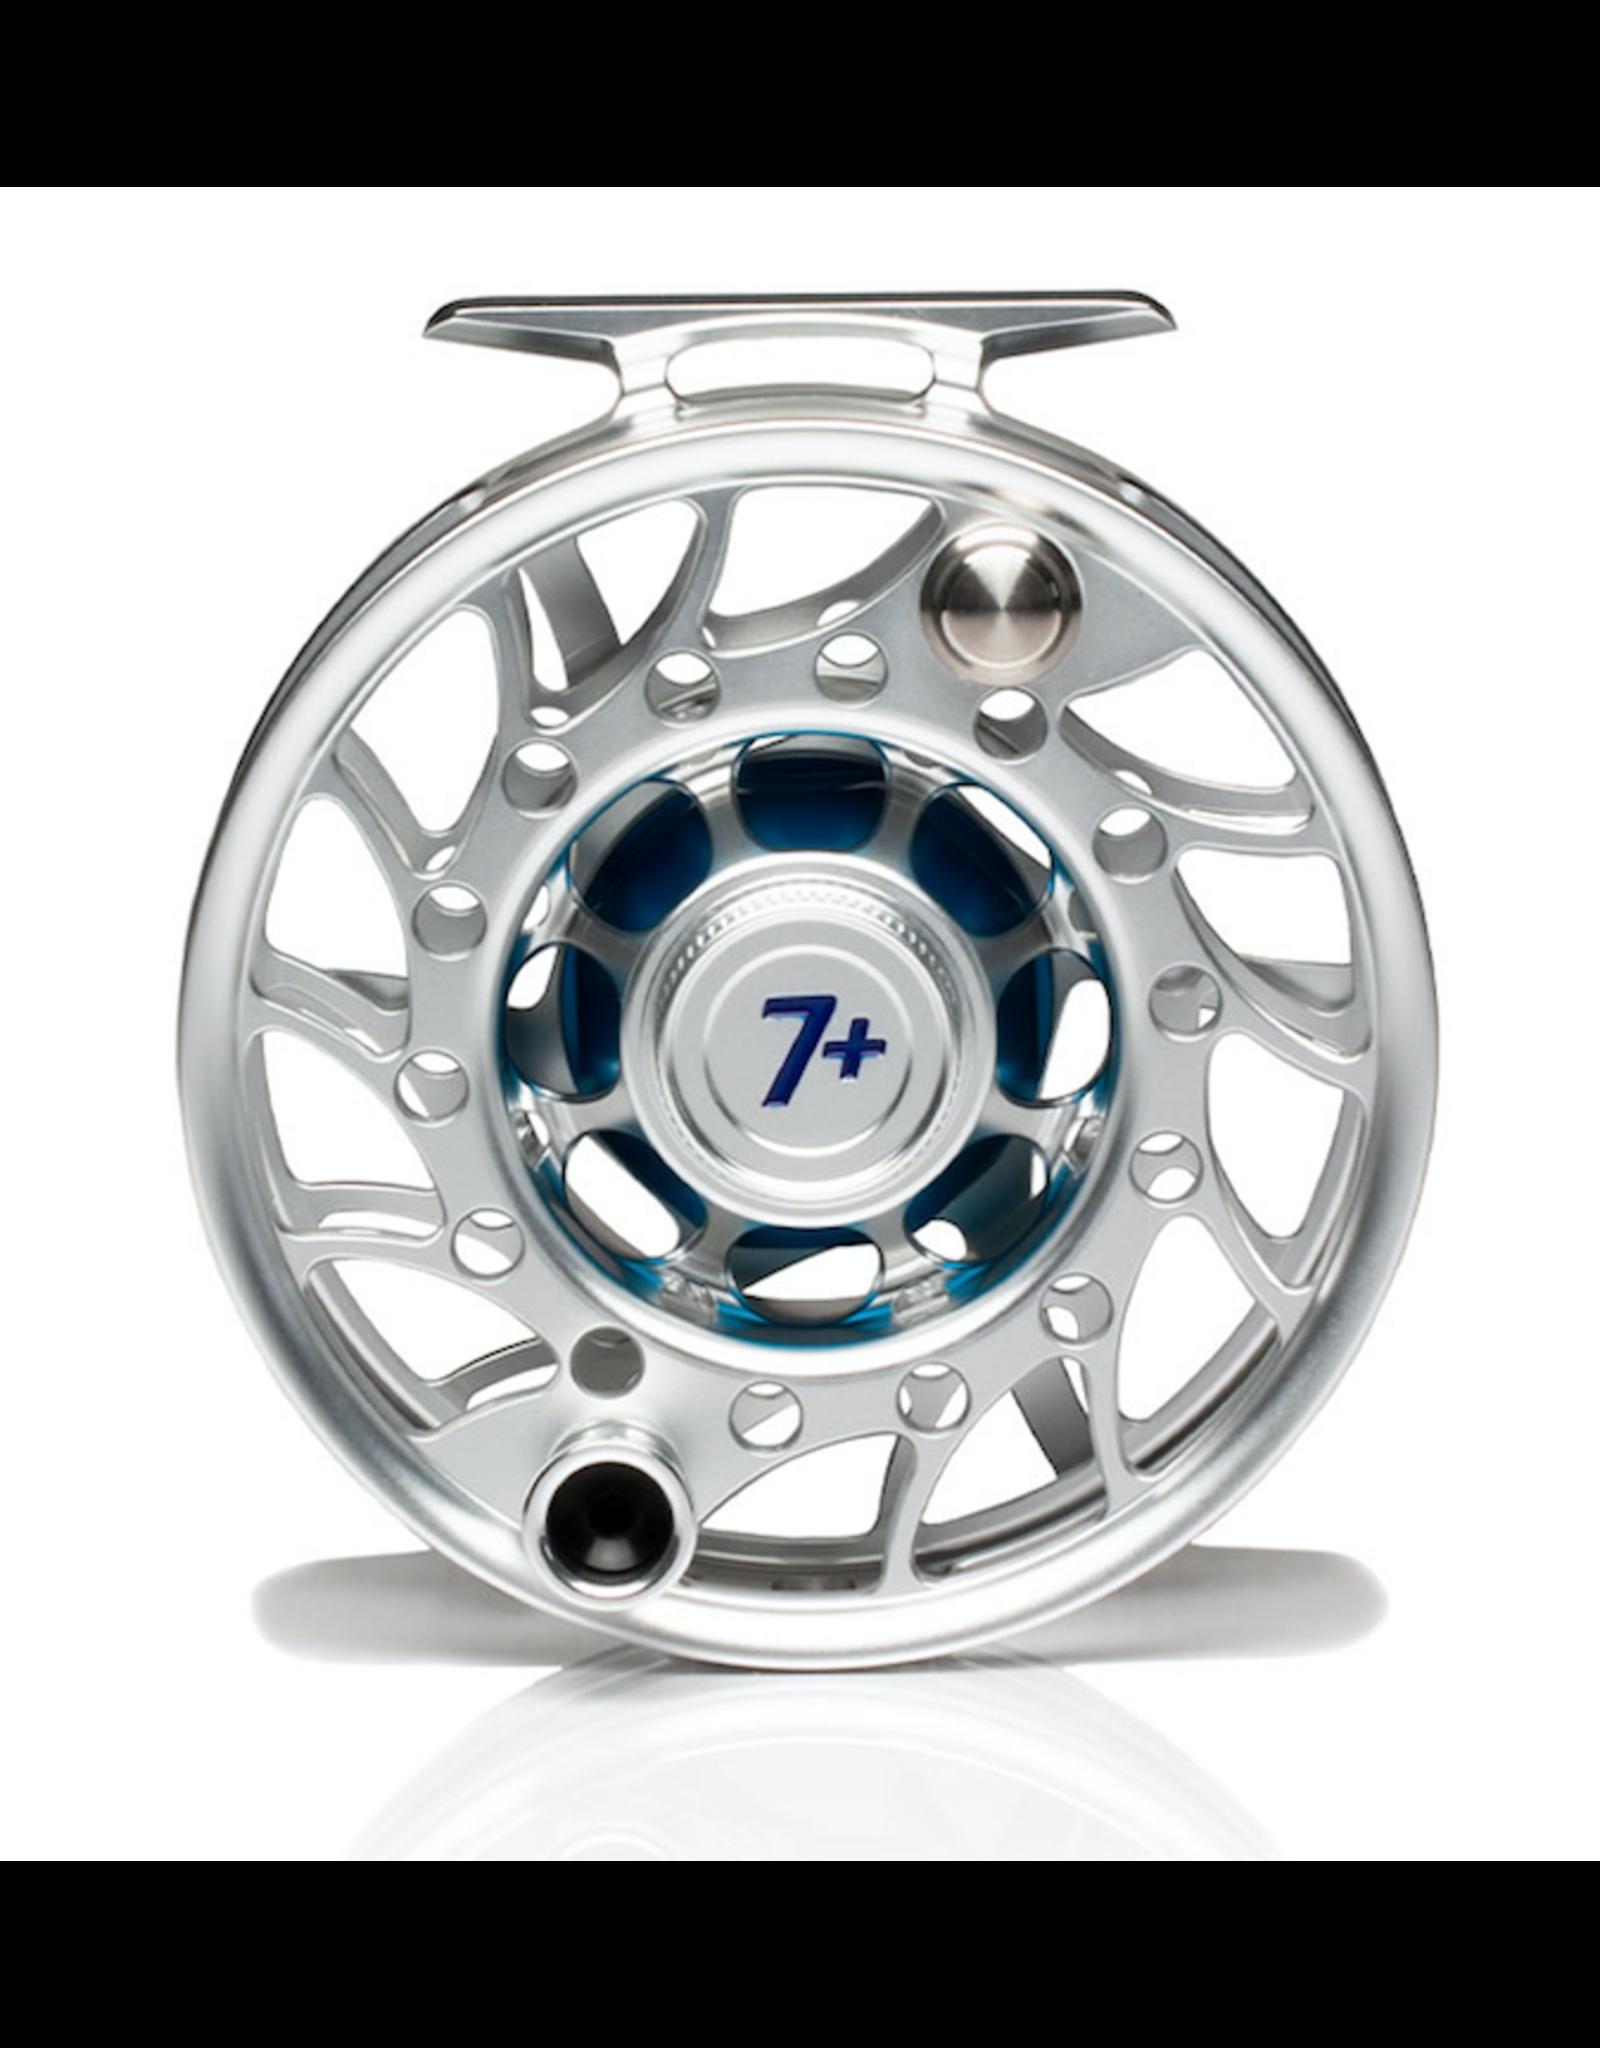 Hatch HATCH Iconic 7 Plus Reel (Clear/ Blue) Mid Arbor